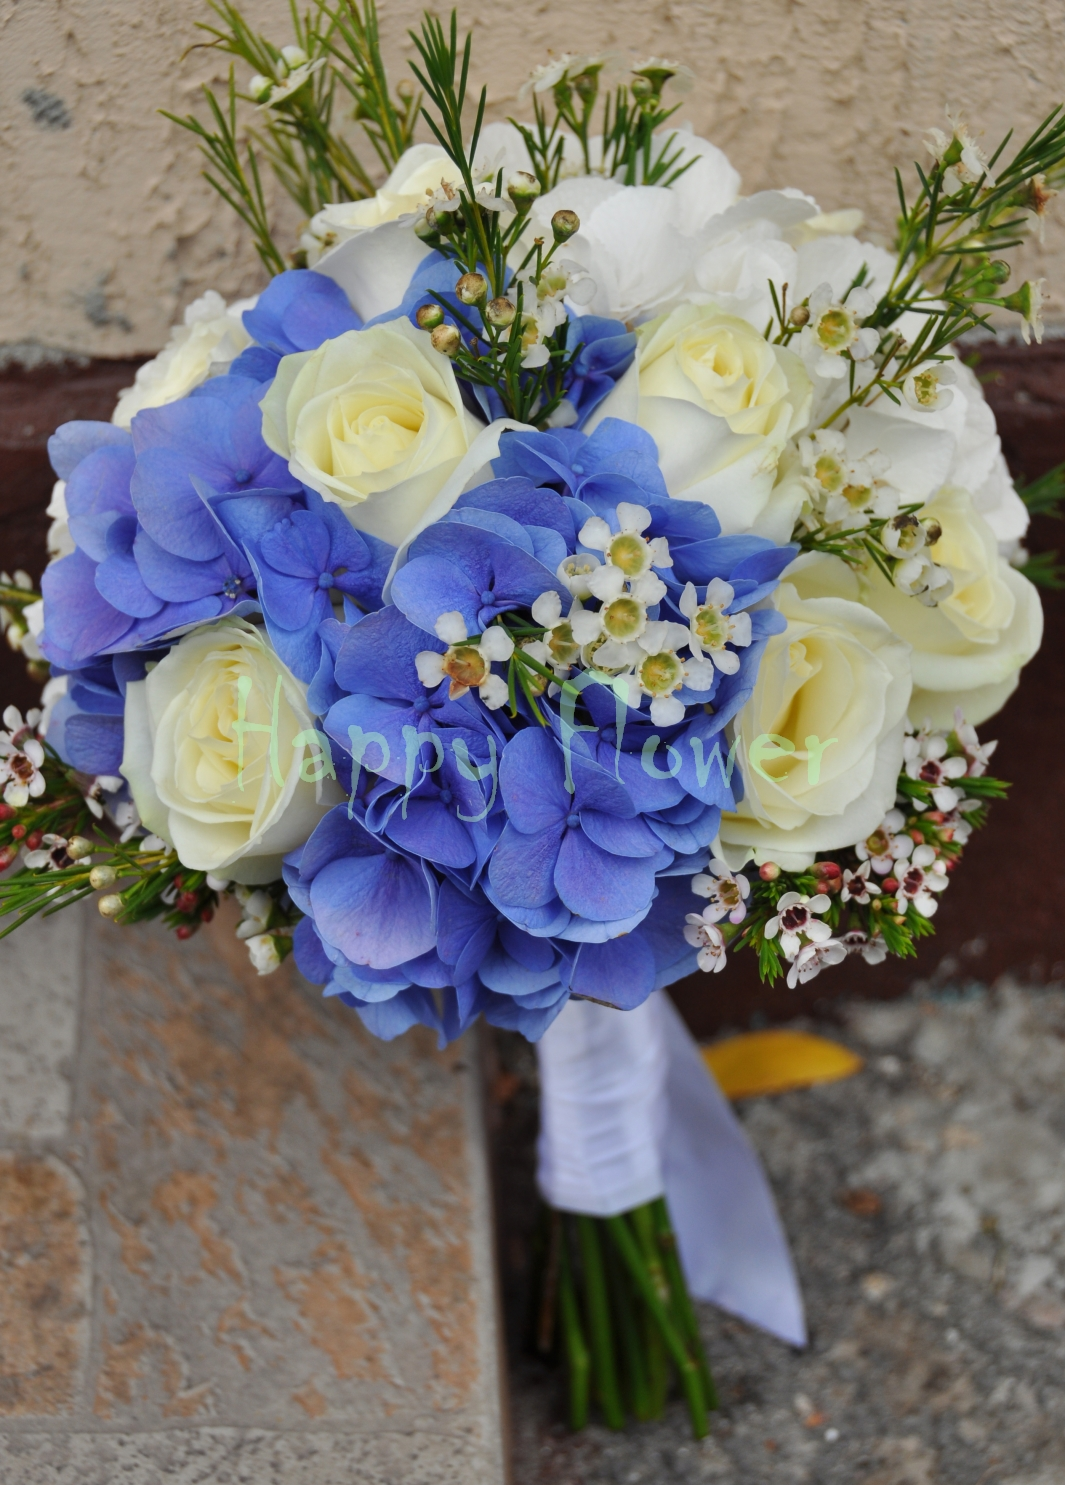 Buchet Mireasa Hortensii Albe Si Albastre Trandafiri Albi